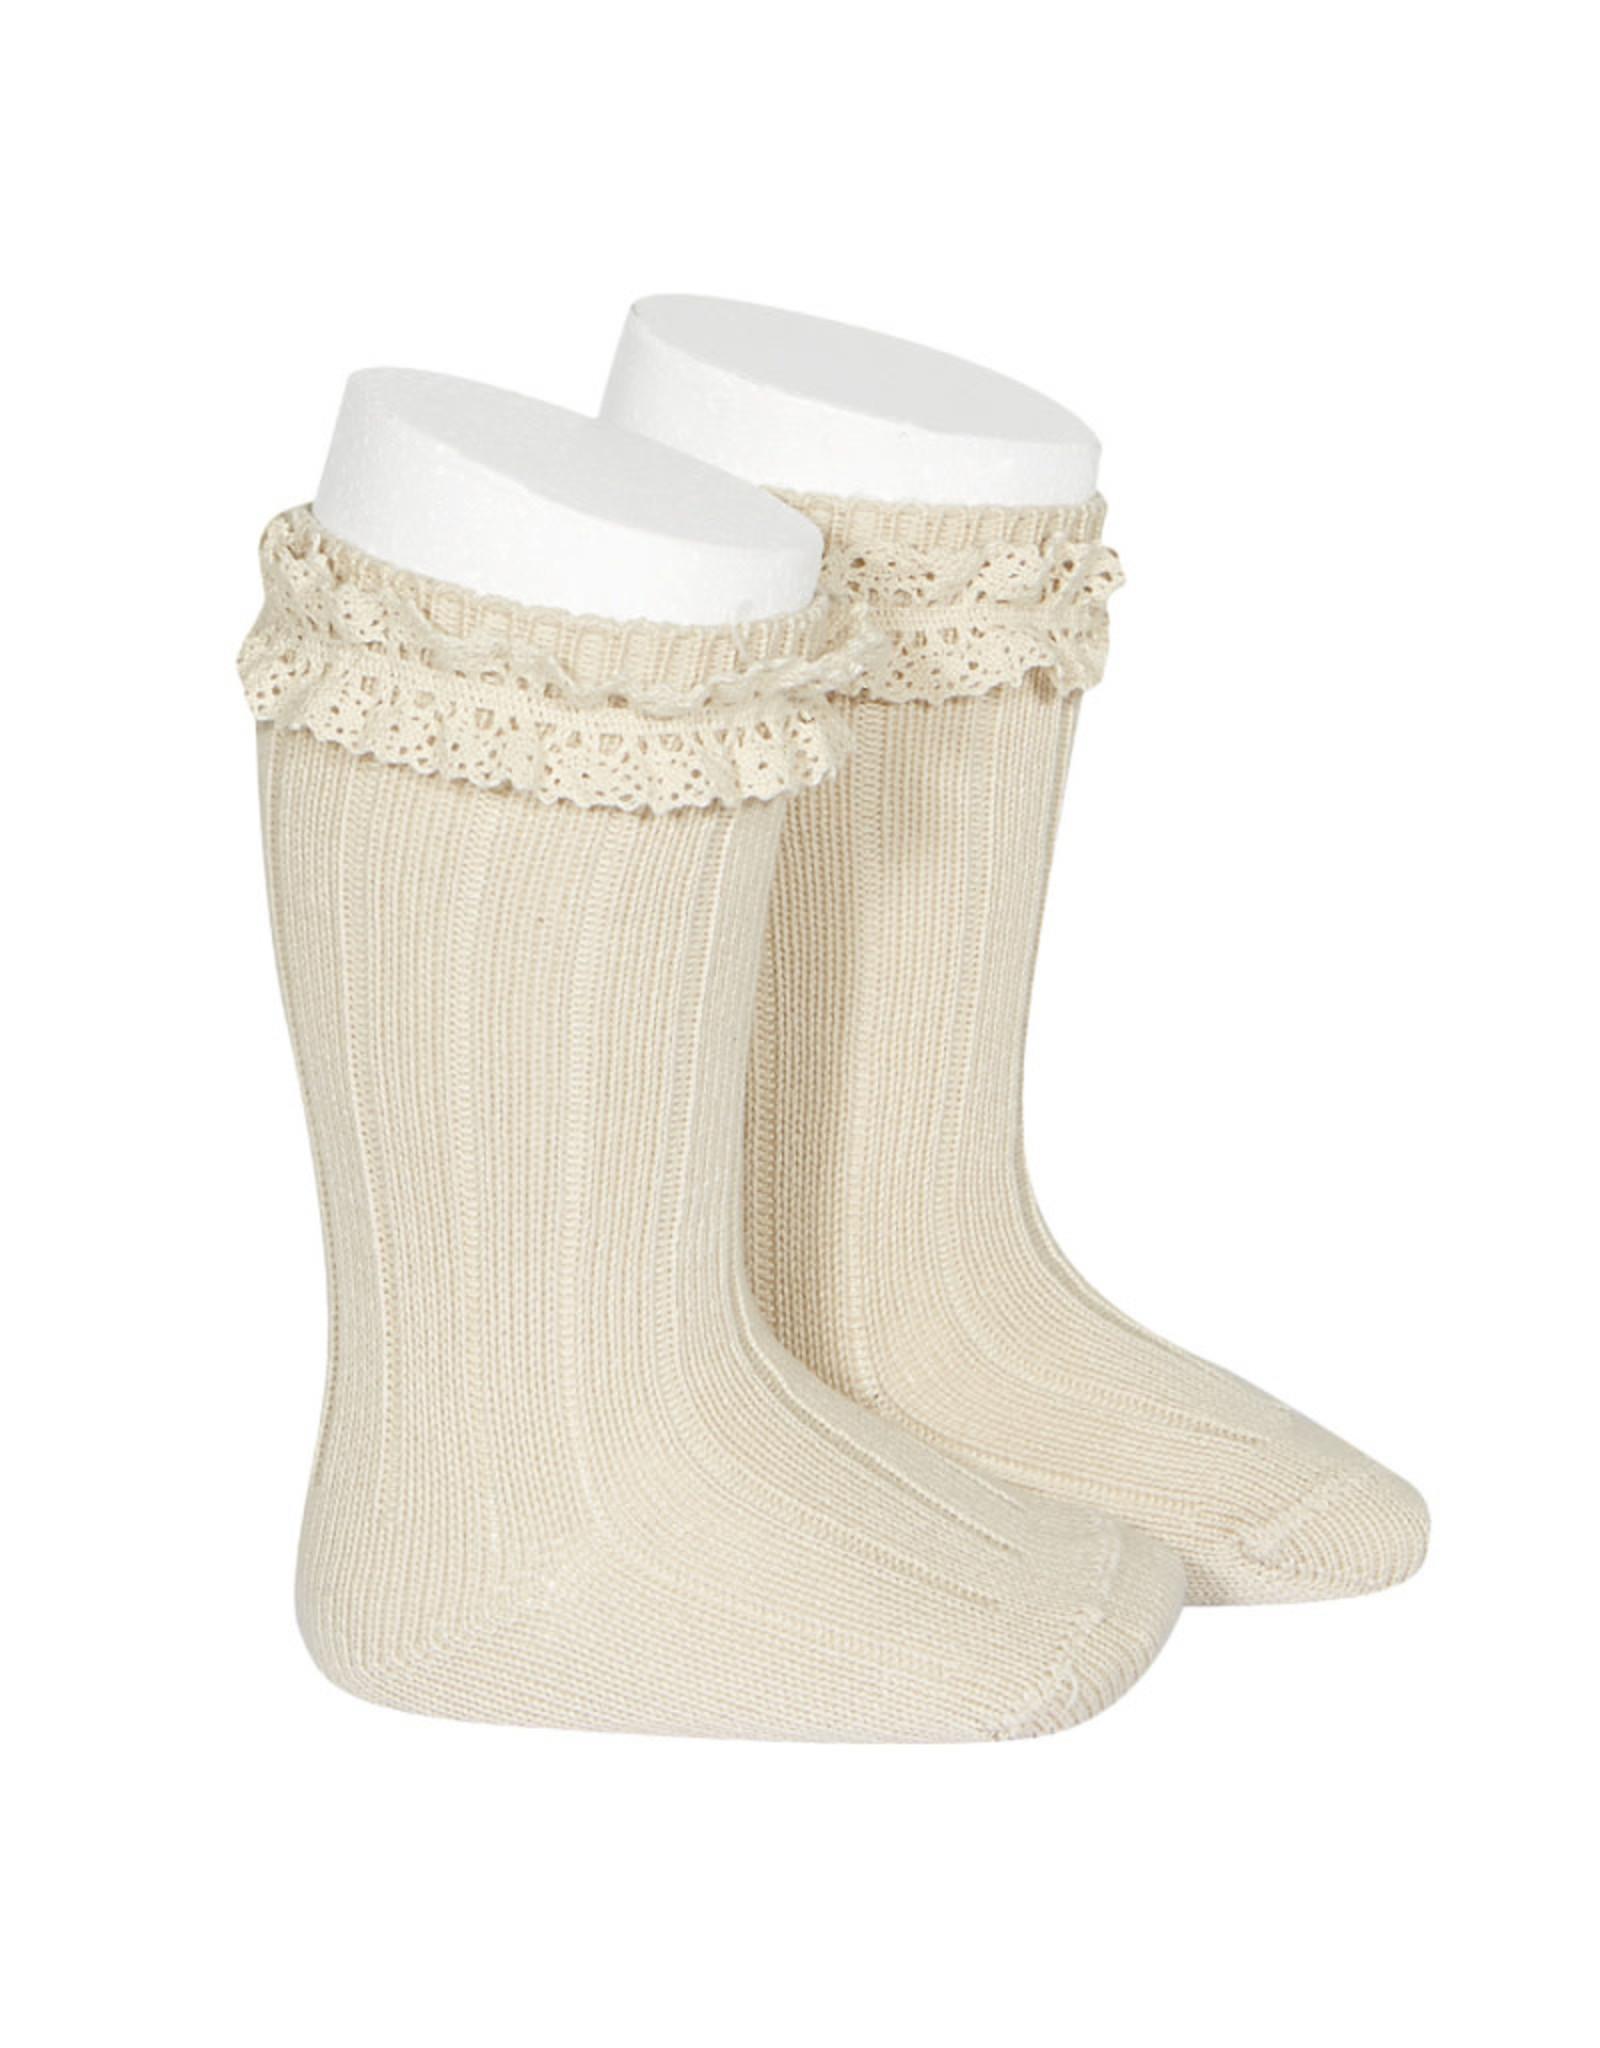 CONDOR Linen Vintage Lace Socks